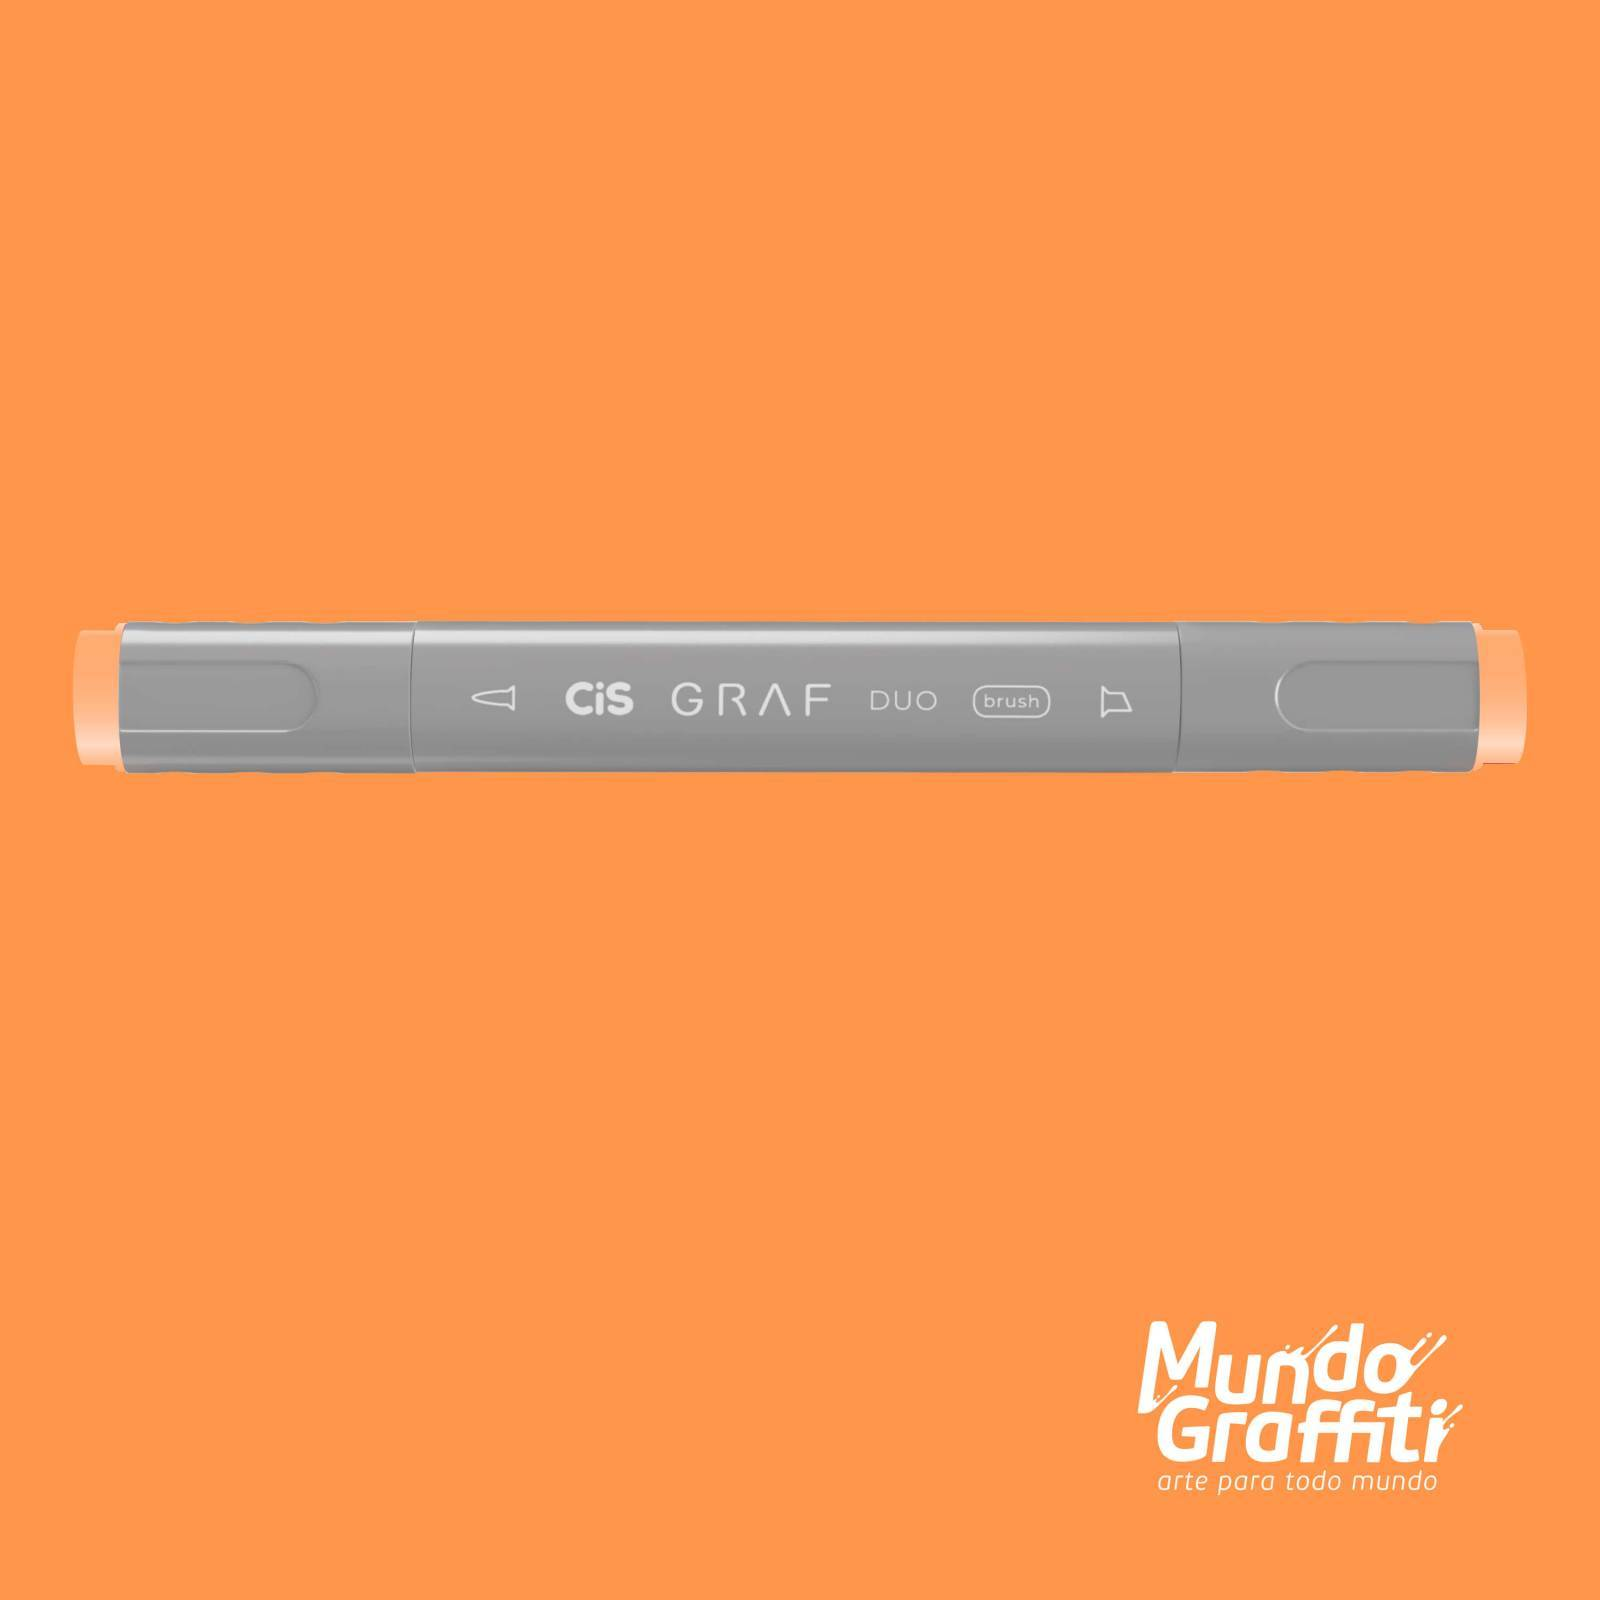 Marcador Cis Graf Duo Brush Marigold 24 - Mundo Graffiti